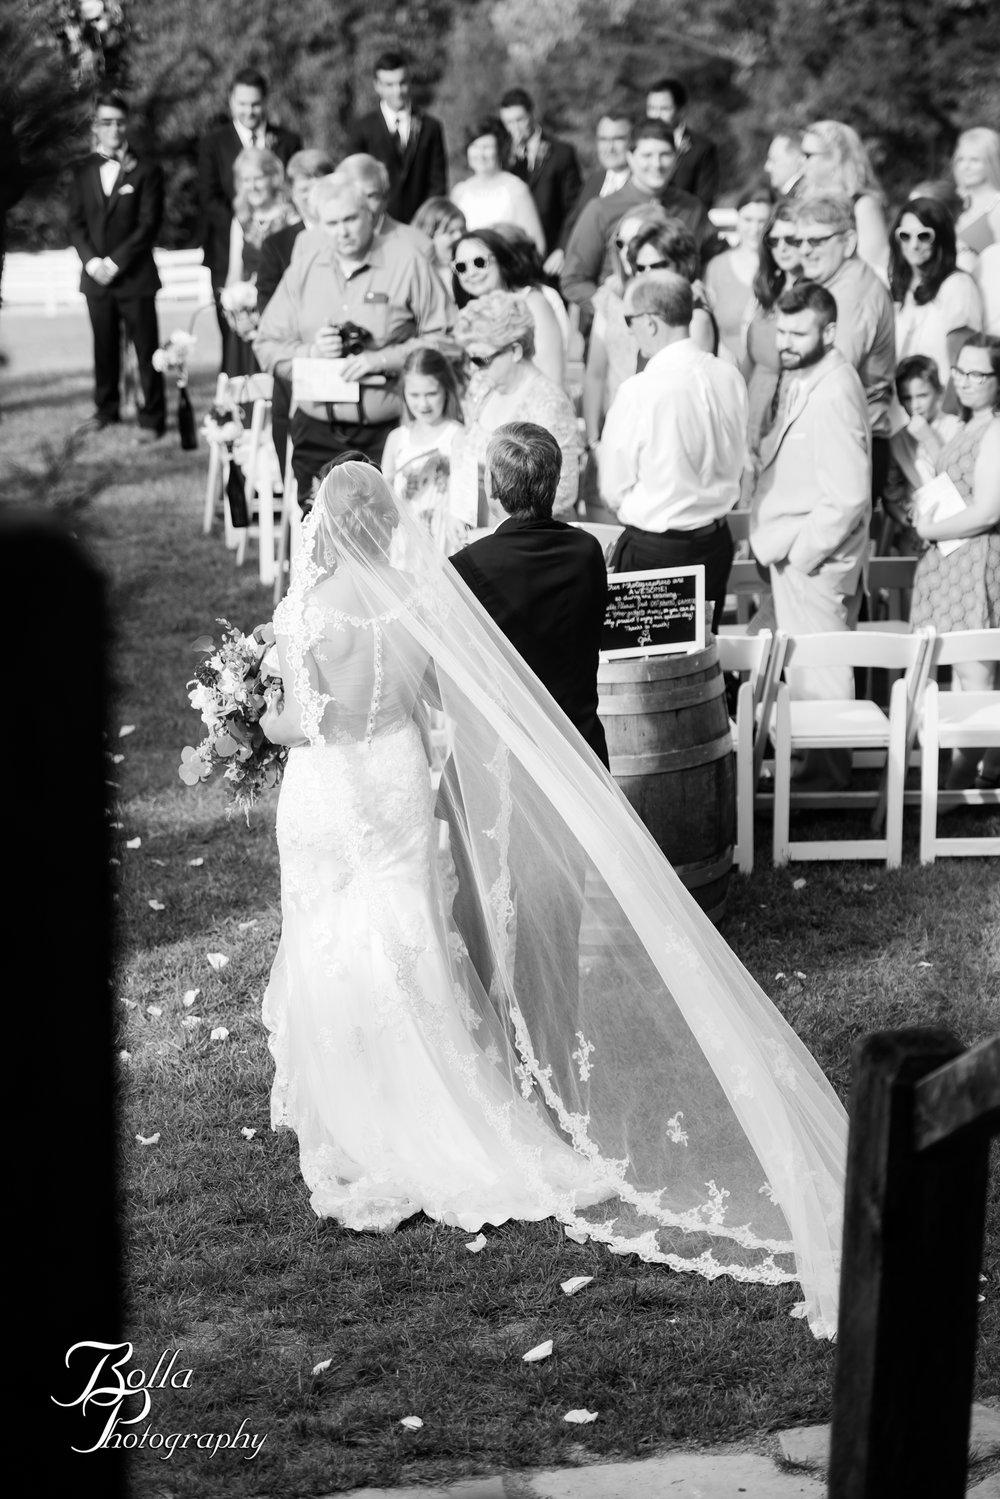 Bolla_photography_edwardsville_wedding_photographer_st_louis_weddings_Chaumette_winery_Mikusch-0346.jpg